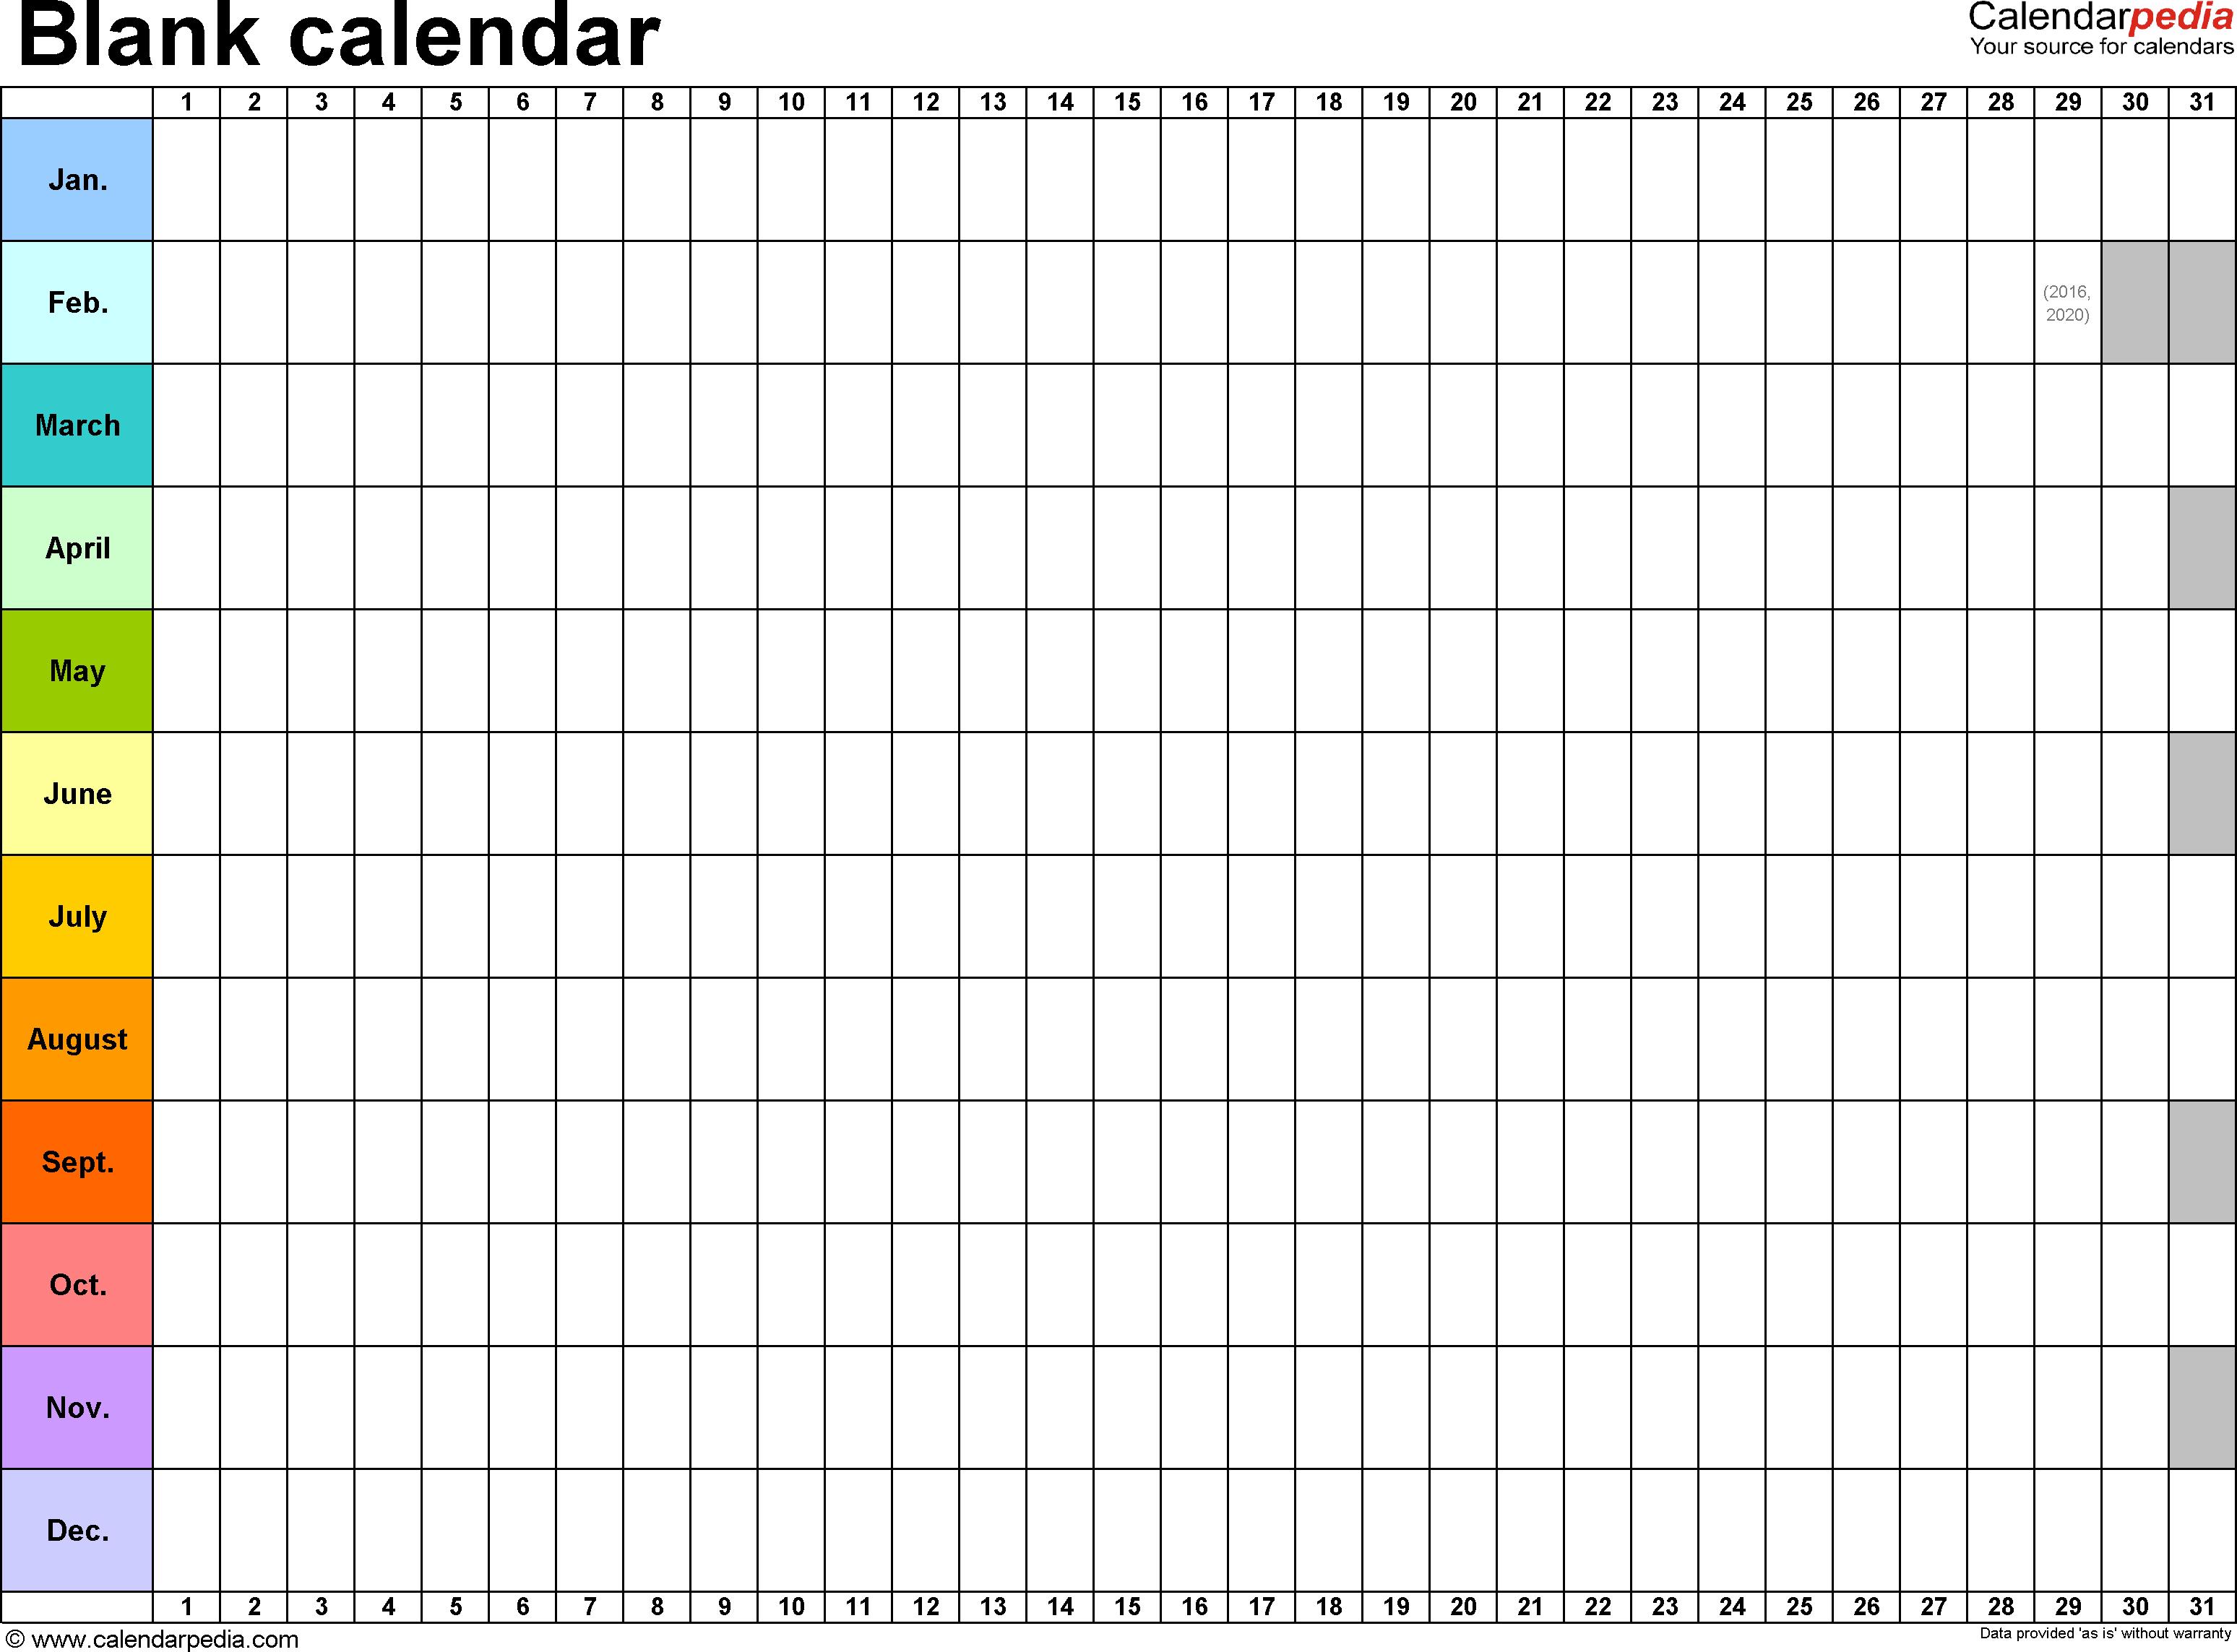 Template 2: Excel Template For Blank Calendar (Landscape Orientation intended for Calendar Planner Template Excel